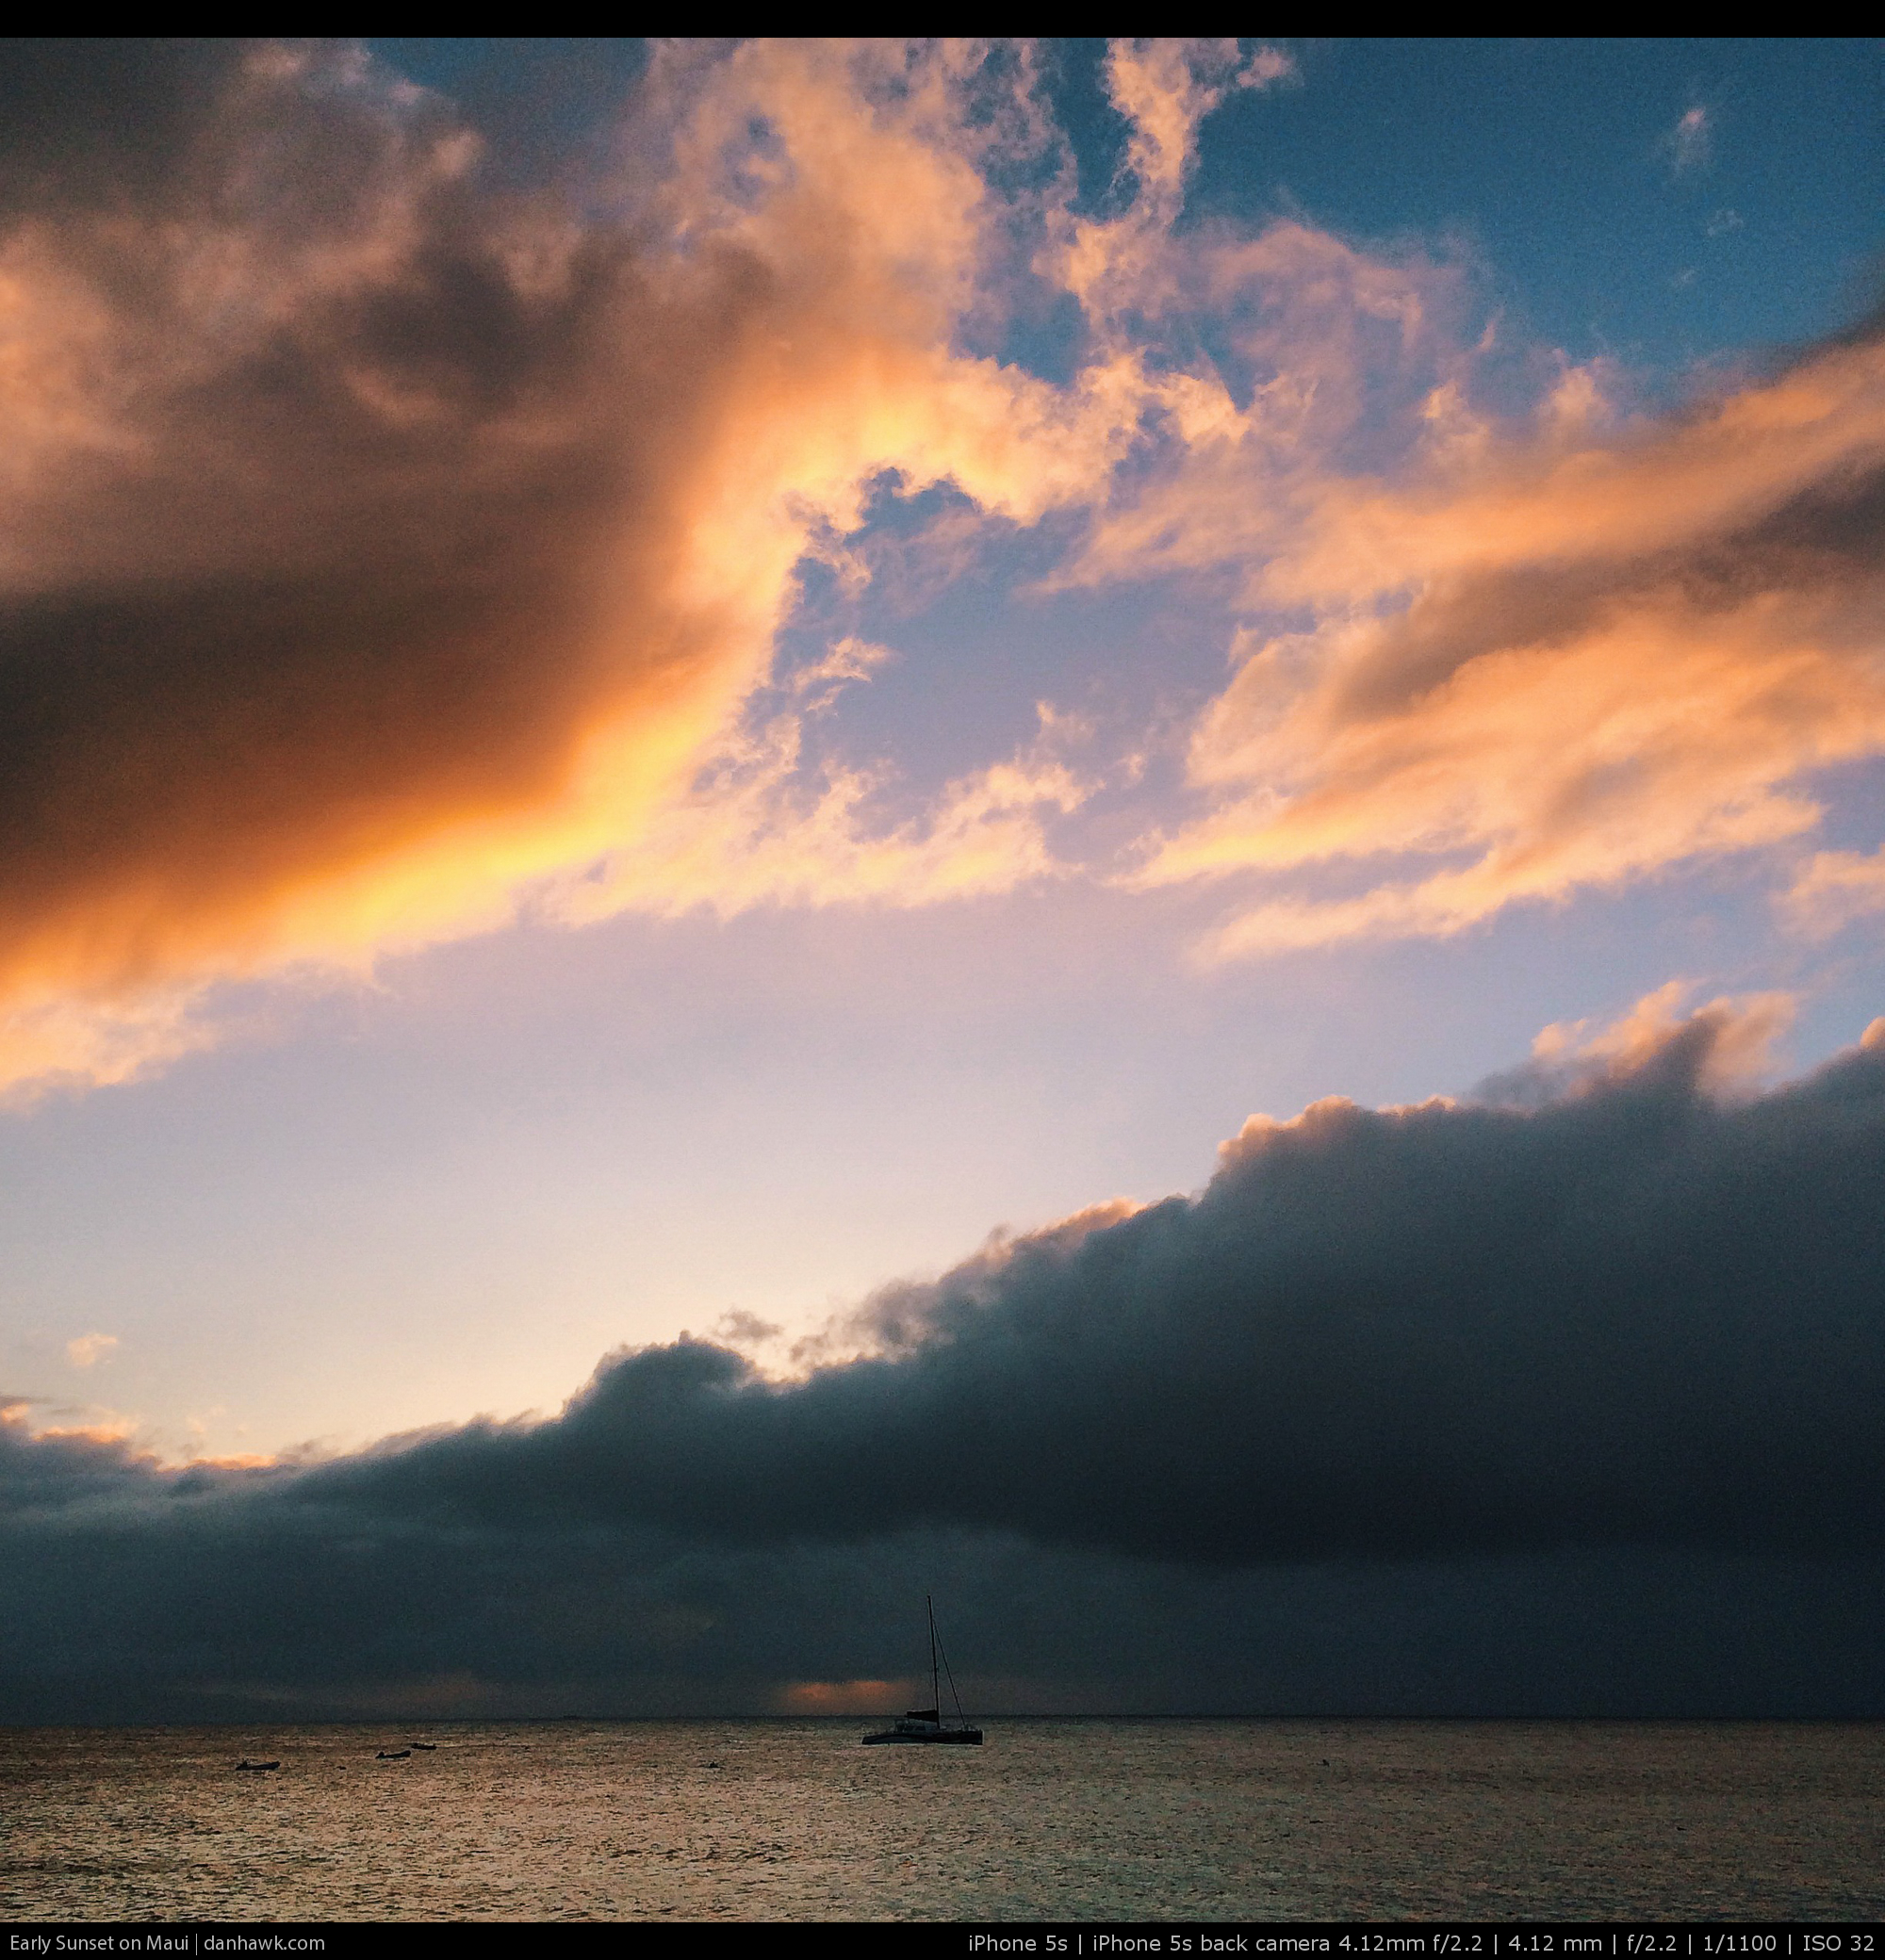 Early Sunset on Maui